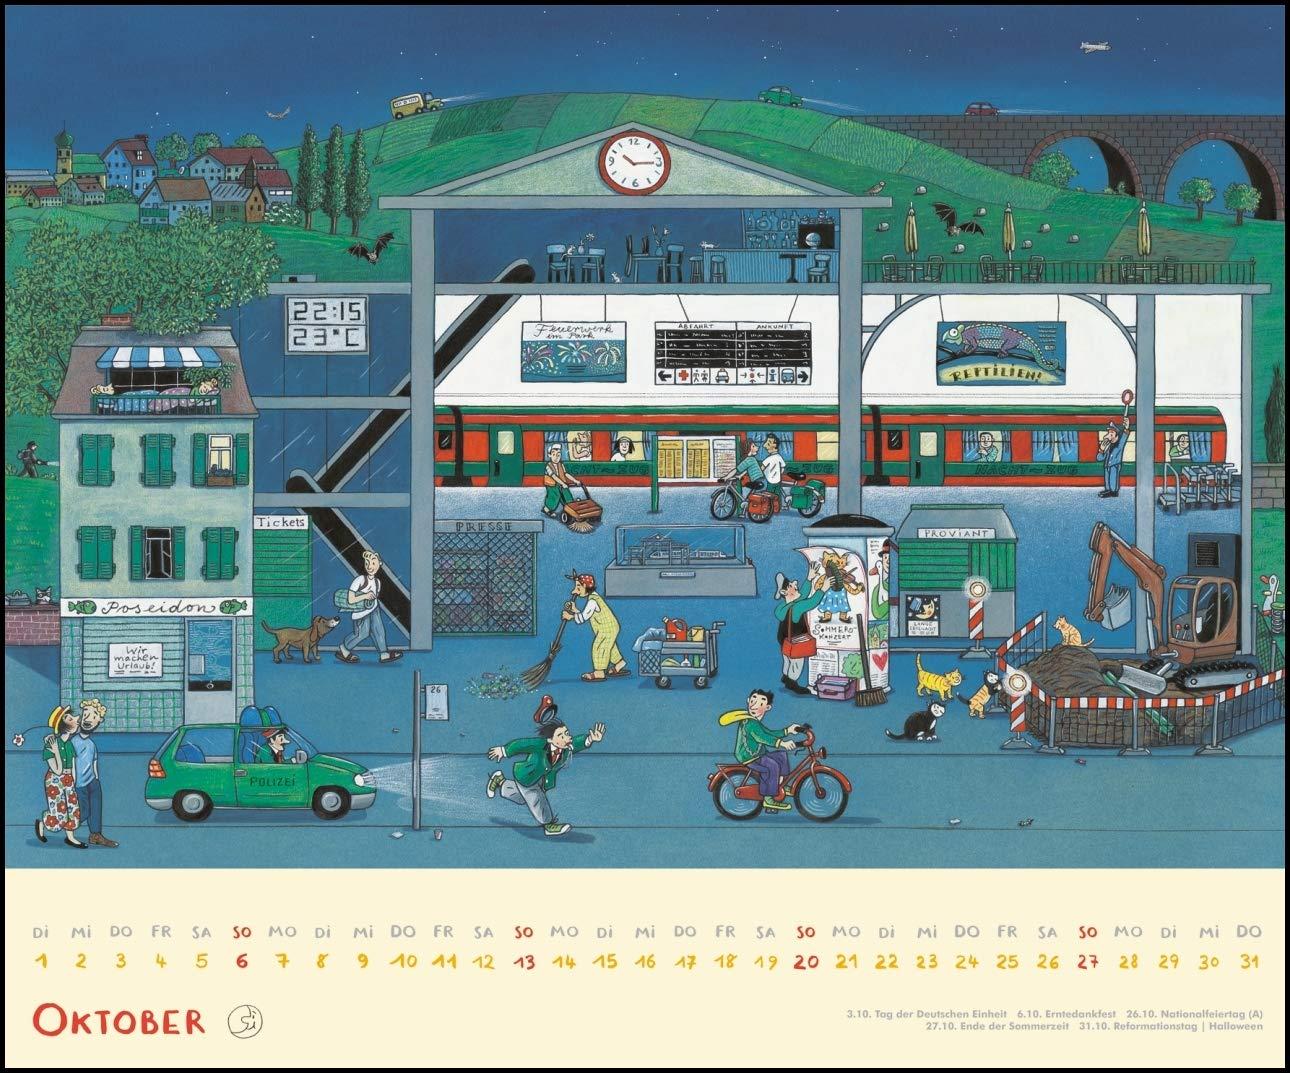 Drei Zimmer Küche Proviant : Wimmel kalender 2019 u2013 dumont kinderkalender u2013 wandkalender 58 4 x